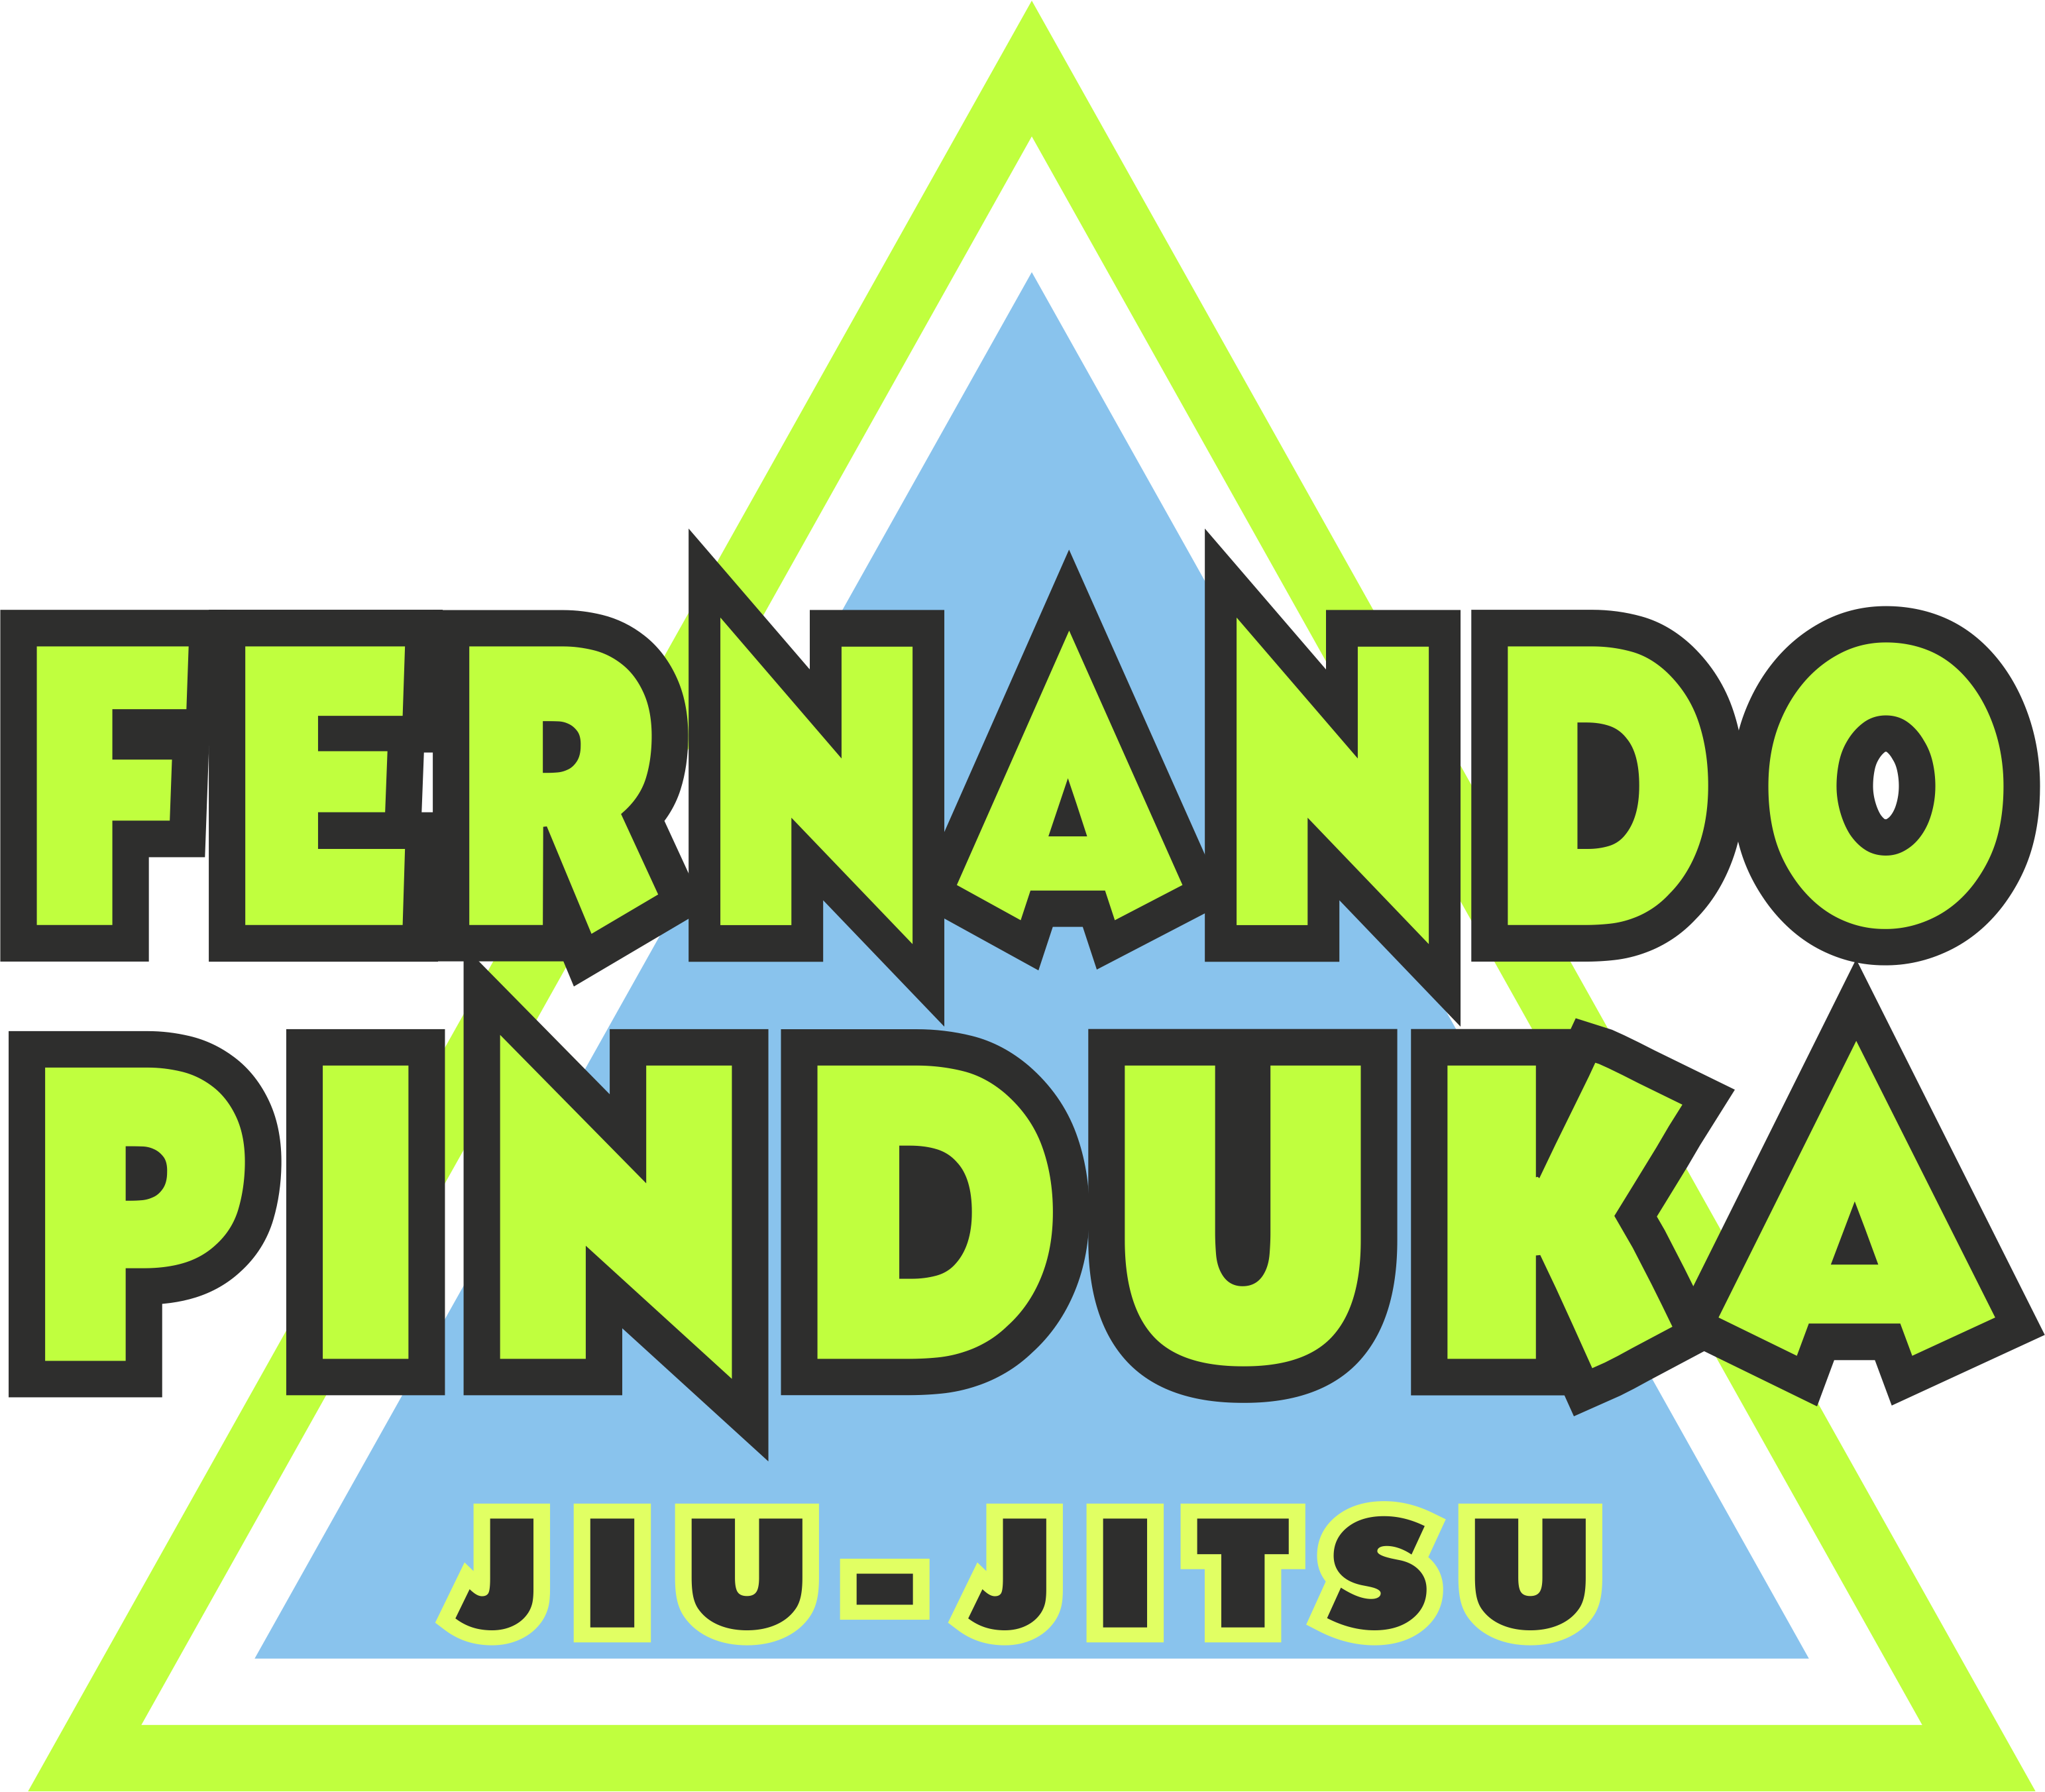 Academia Fernando Pinduka